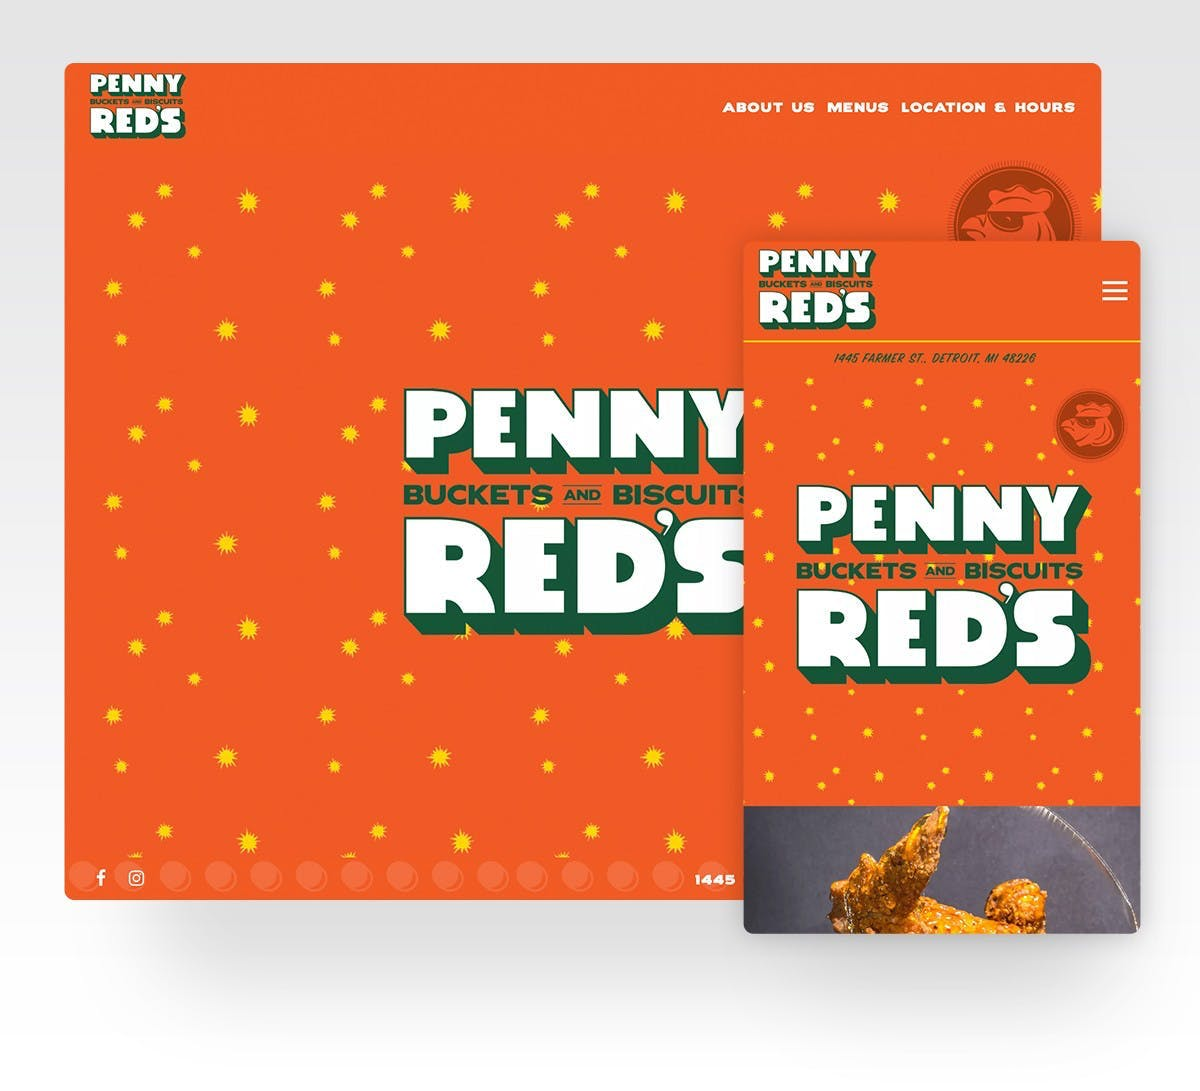 Screenshot of Penny Red's website